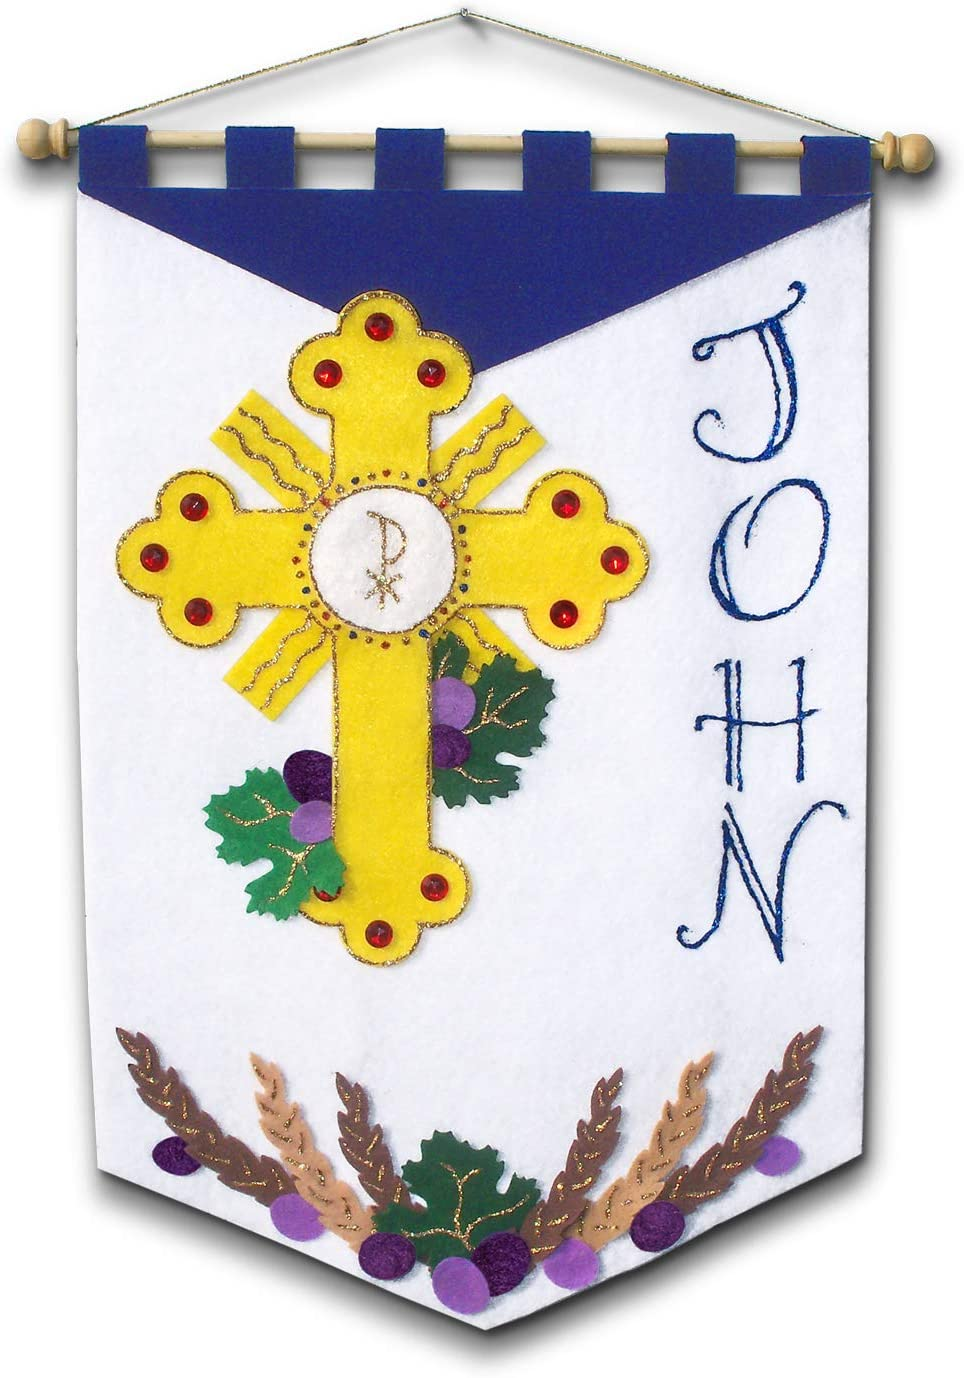 First Communion Banner Kit Adoration Illuminated Ink AX-AY-ABHI-19067 12 x 18